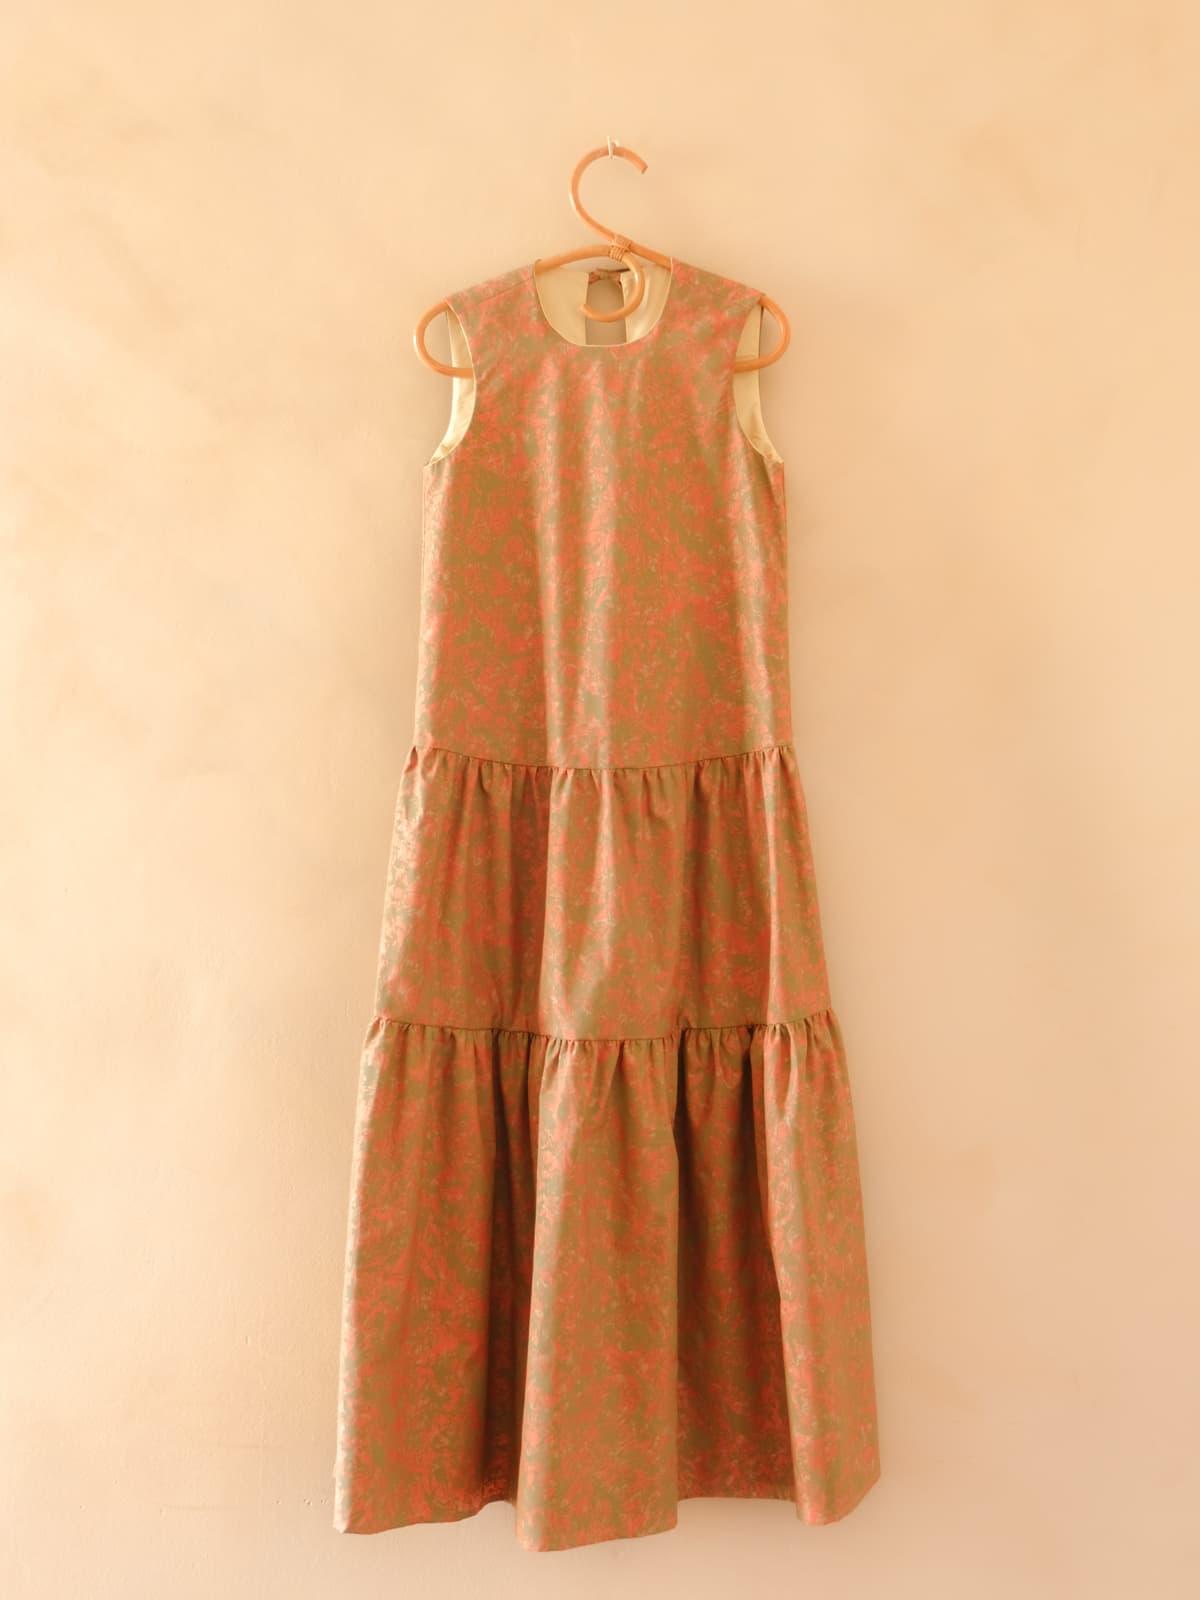 marbled dress